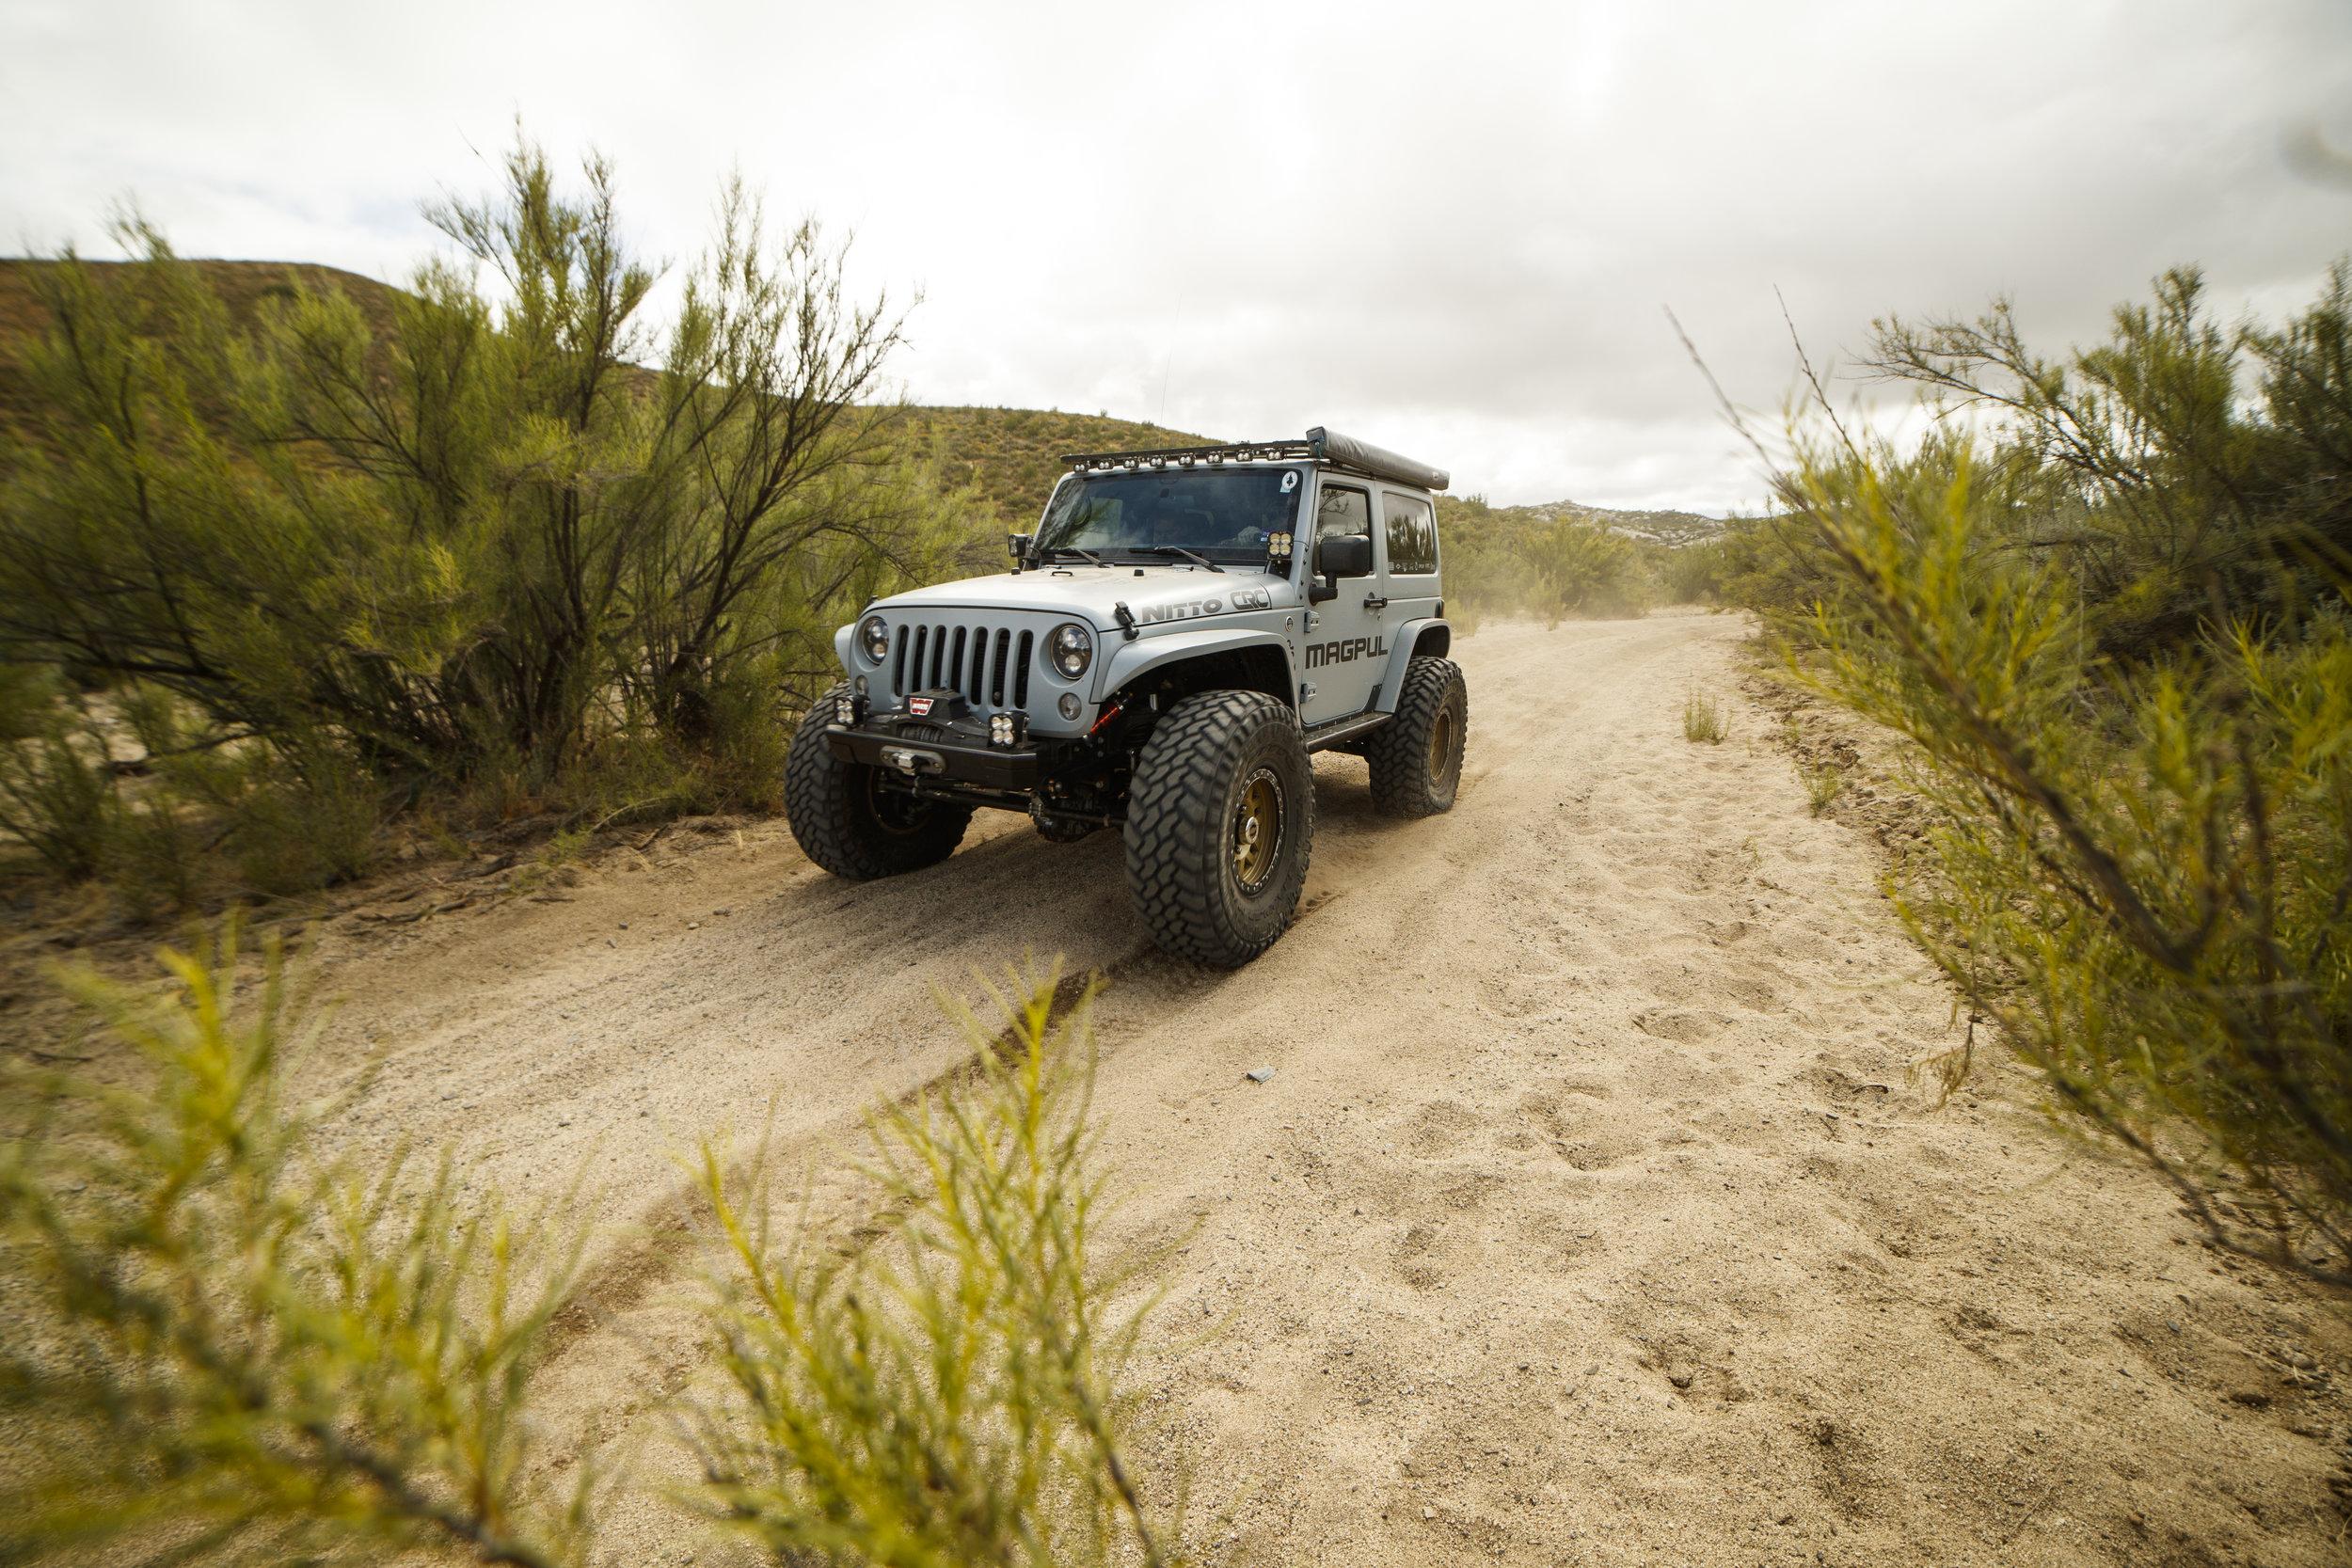 6_24_CaseyCurrie_Baja500PreRunning_BajaMexico_Jeep_012.jpg